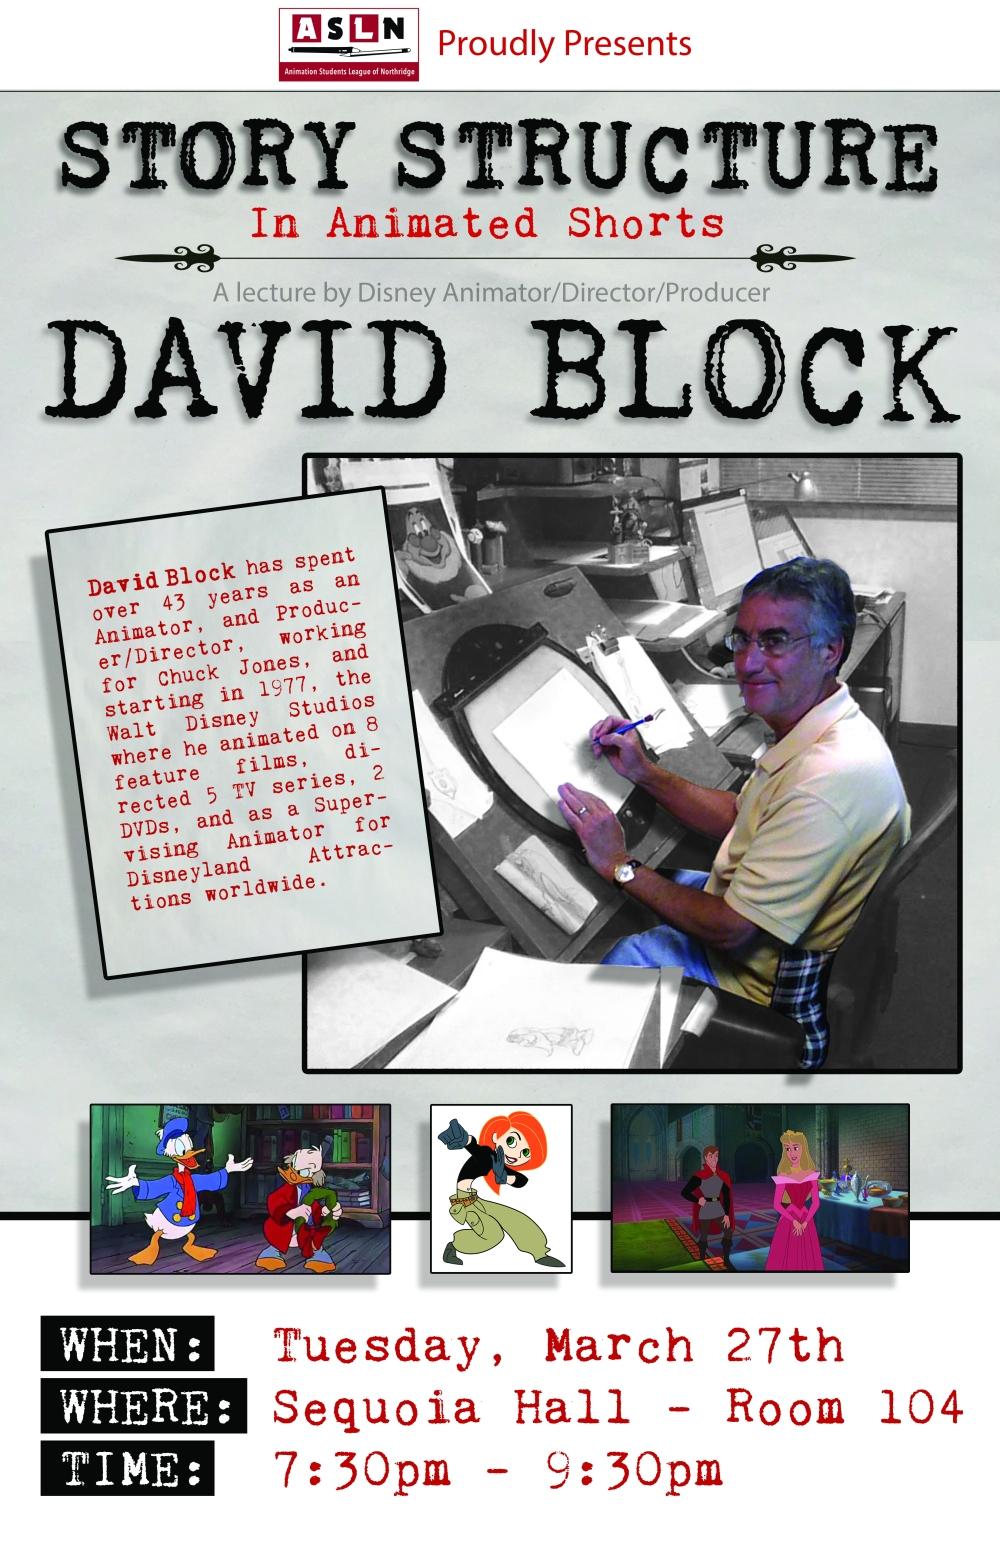 2018_11x17PosterDesign_DavidBlock.jpg